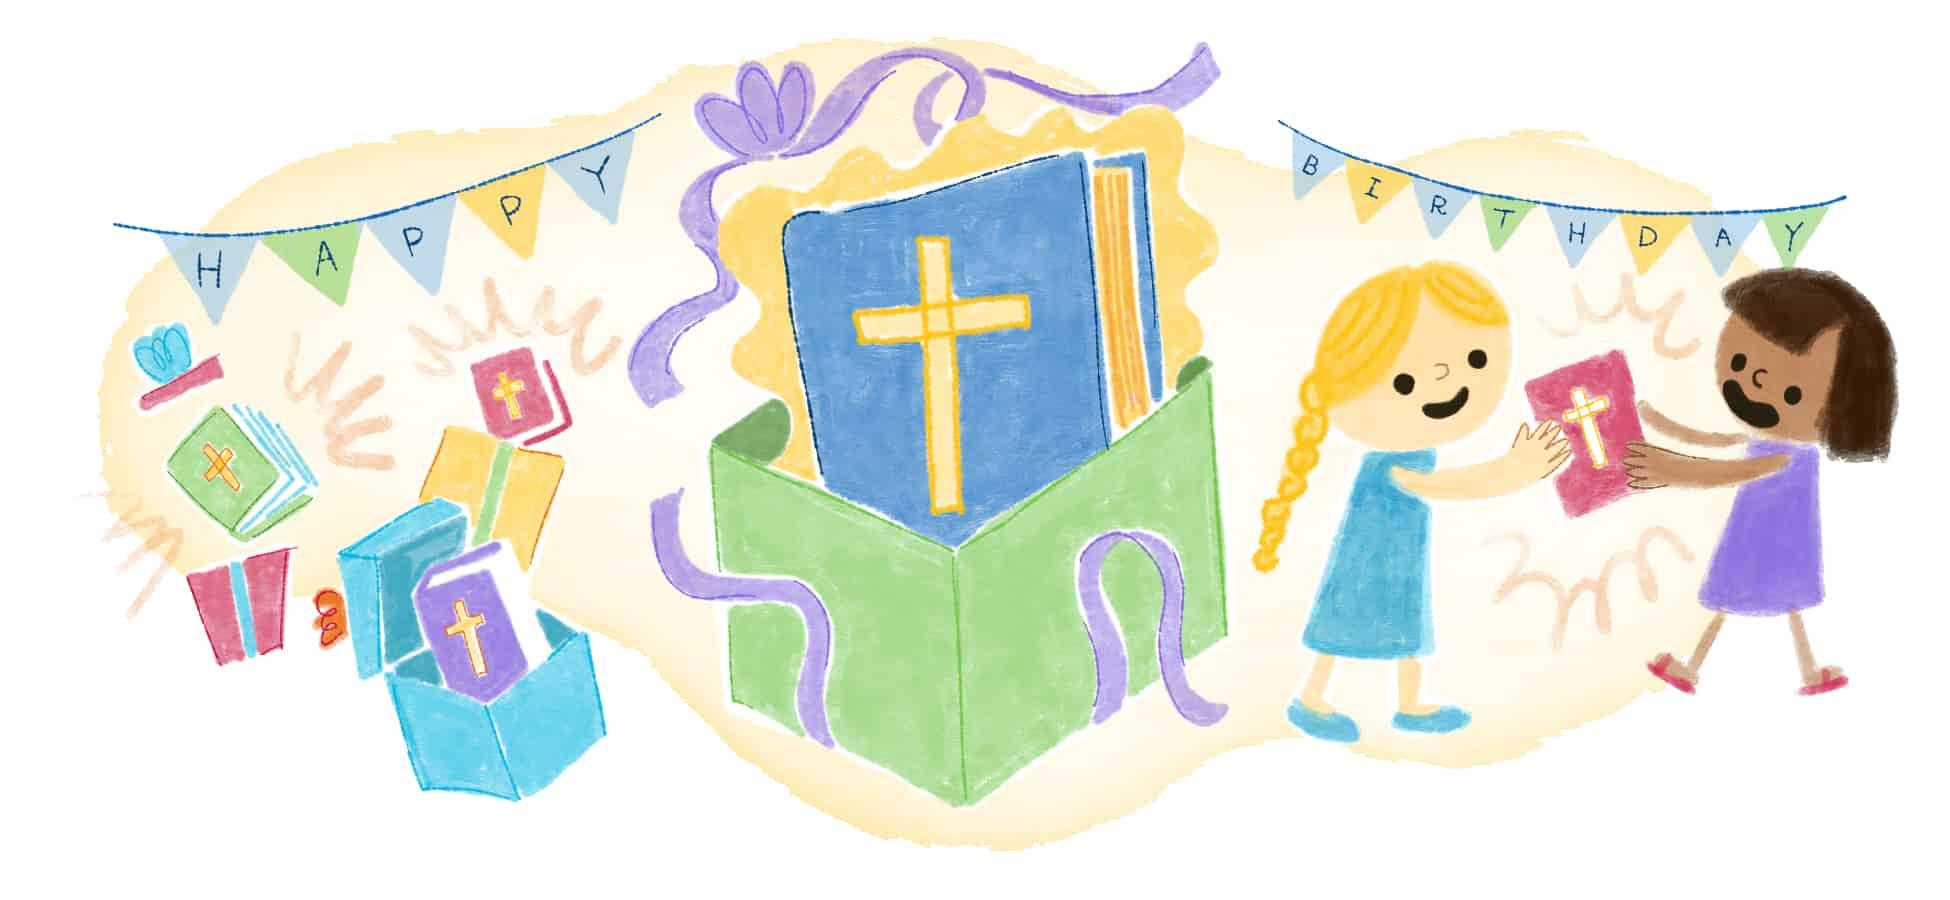 Care-BirthdayBibles